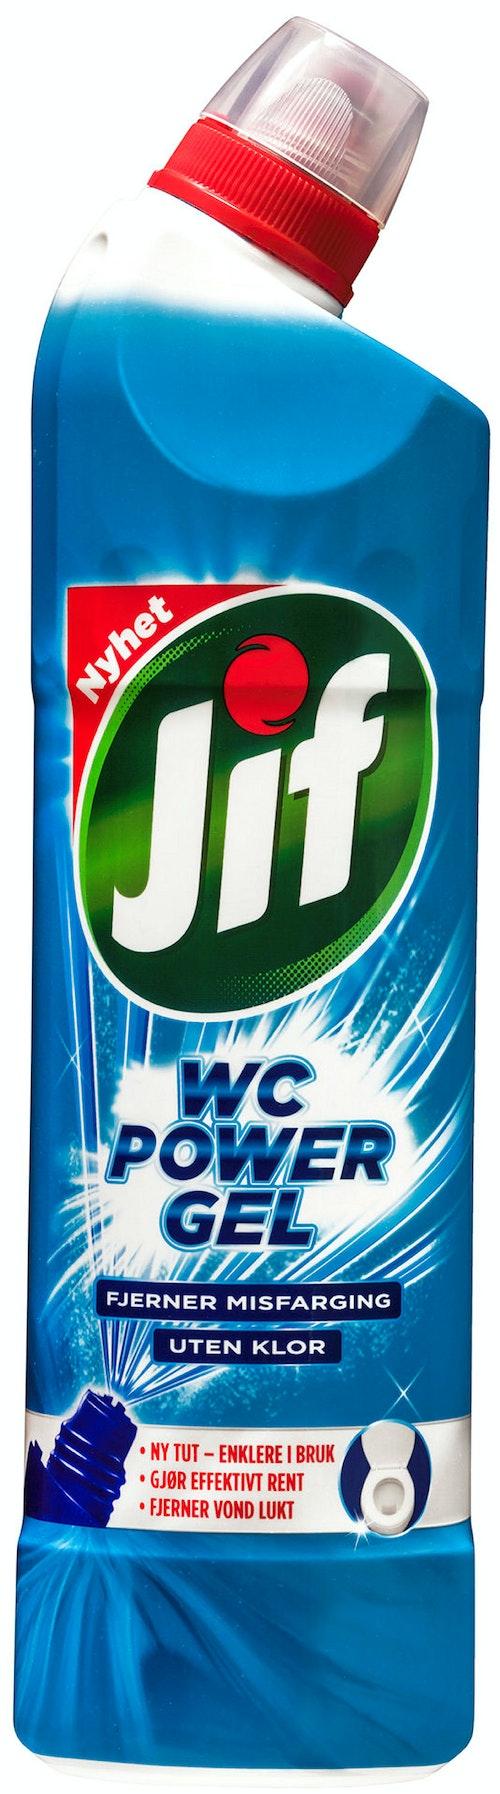 Jif Jif WC Power Gel Uten klor, 750 ml